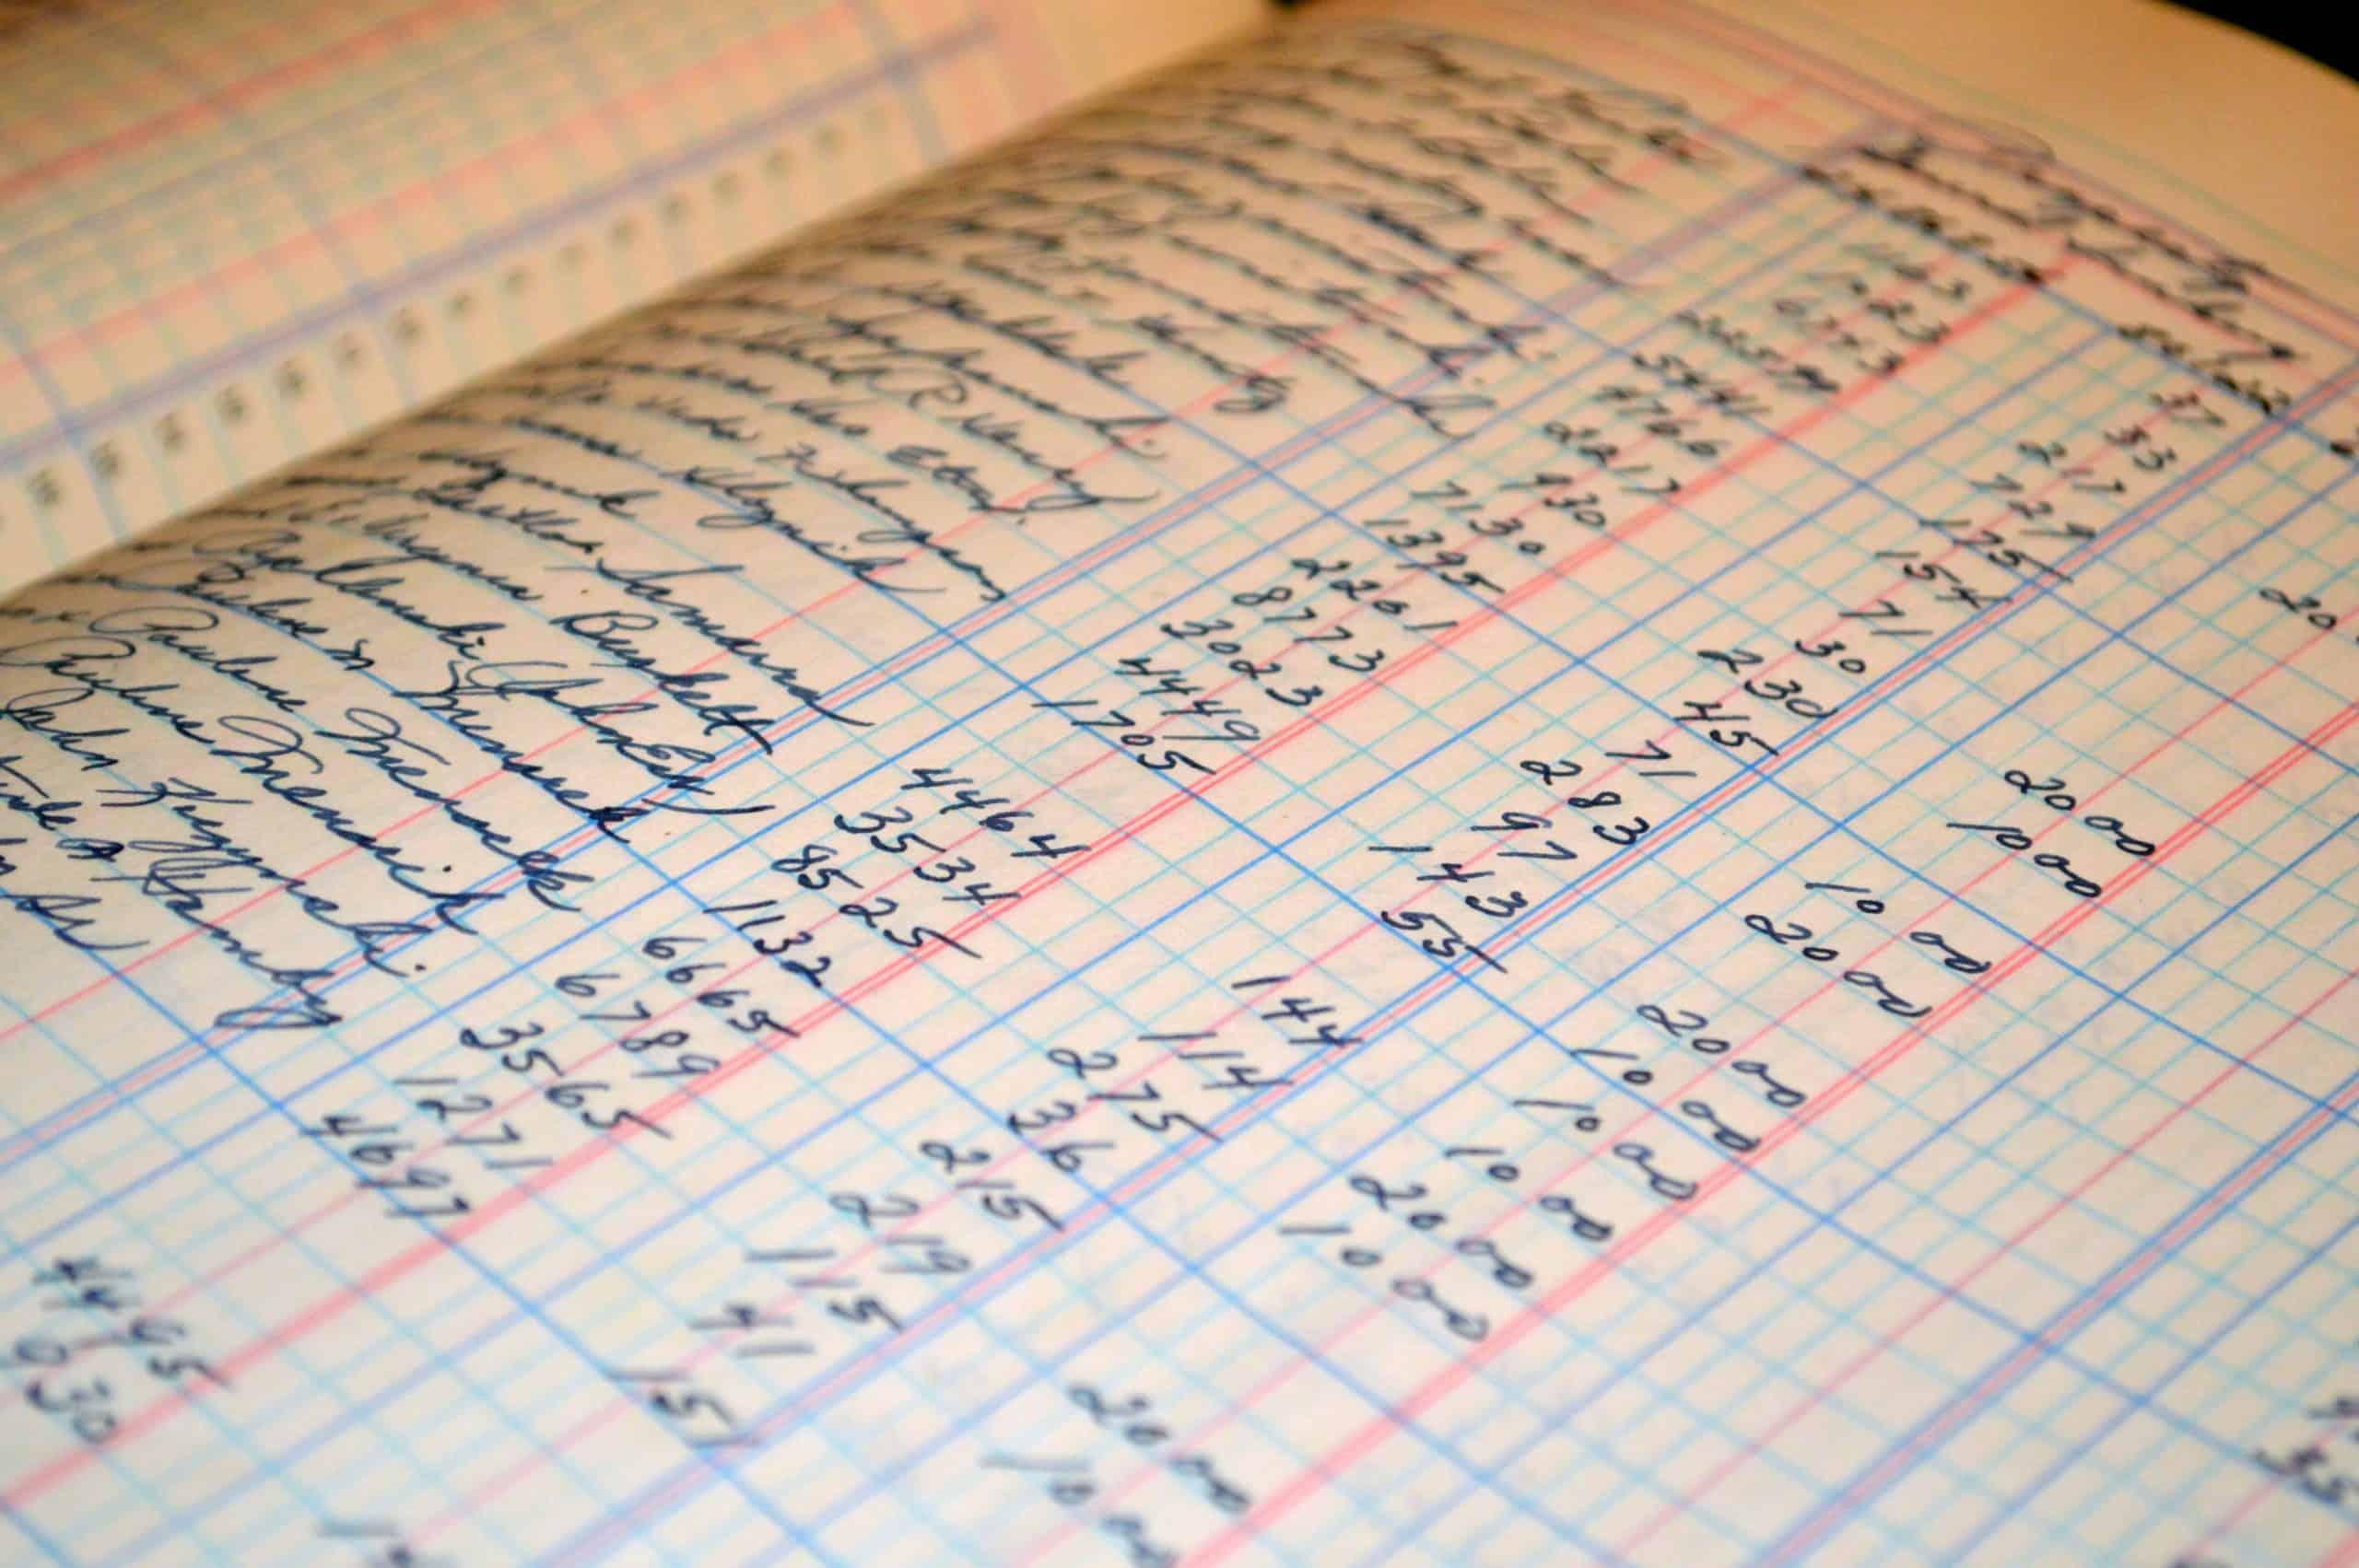 Managing Subsidiary Companies with Abio